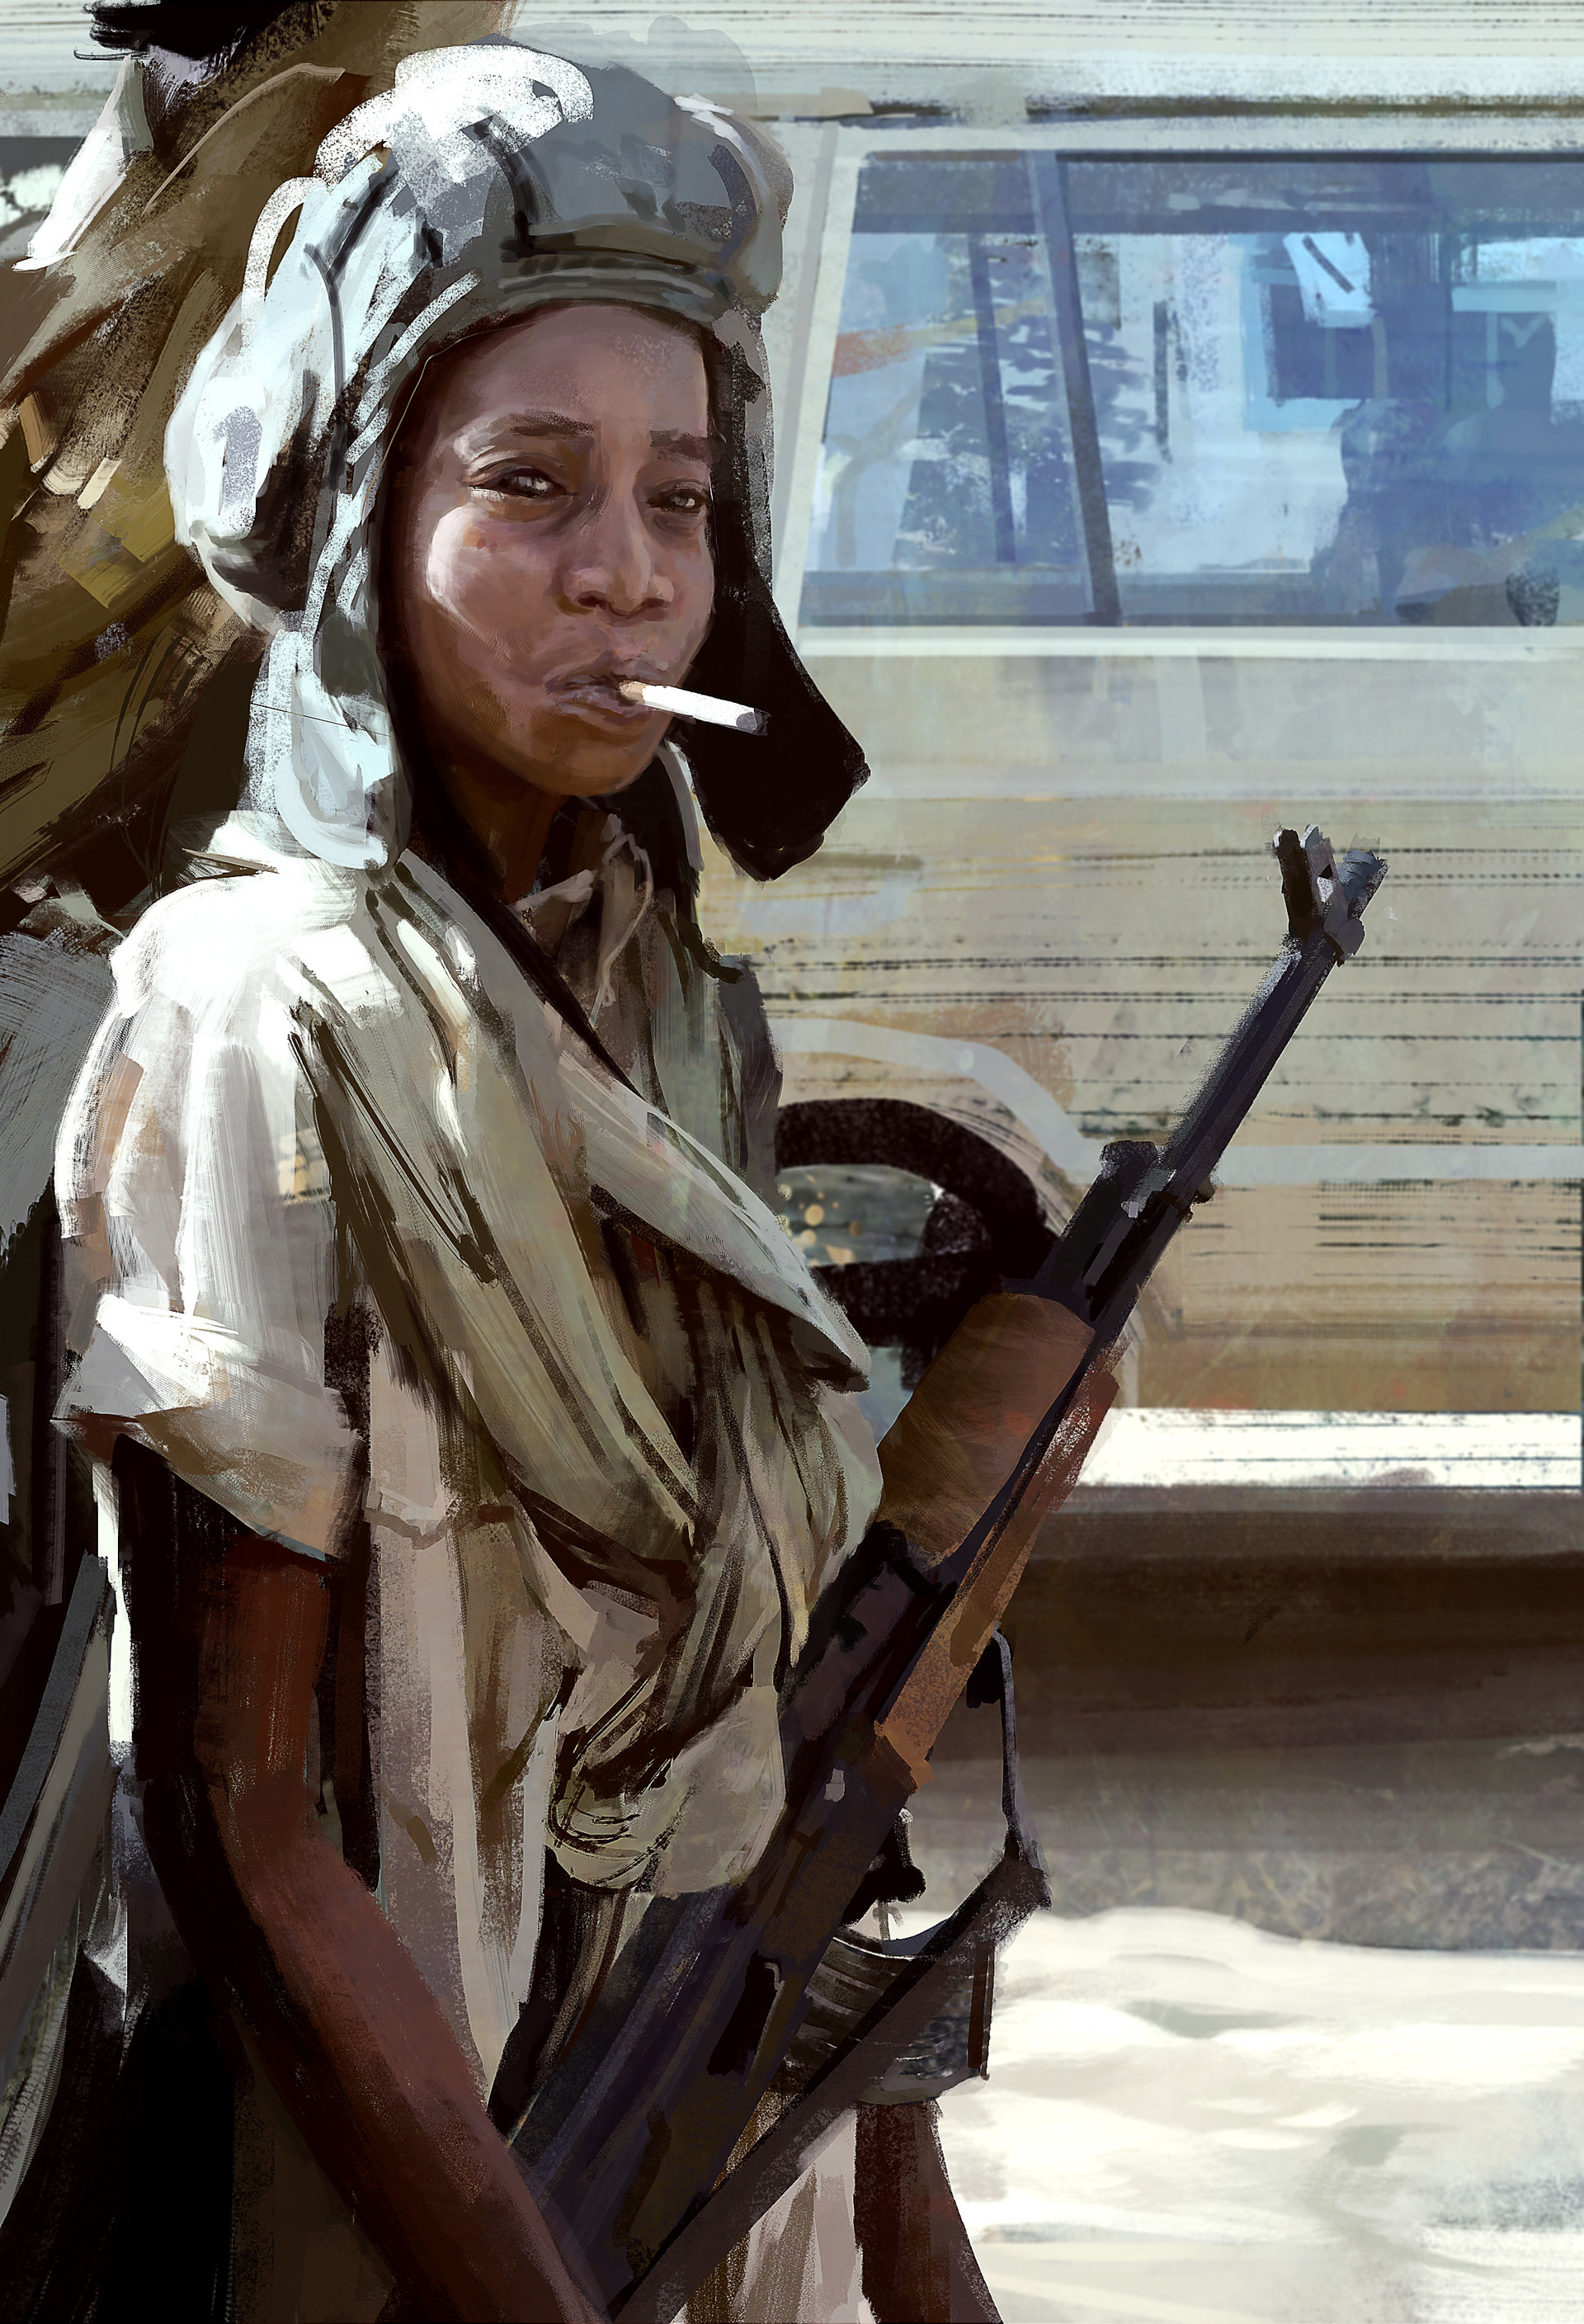 Child soldier Sudan